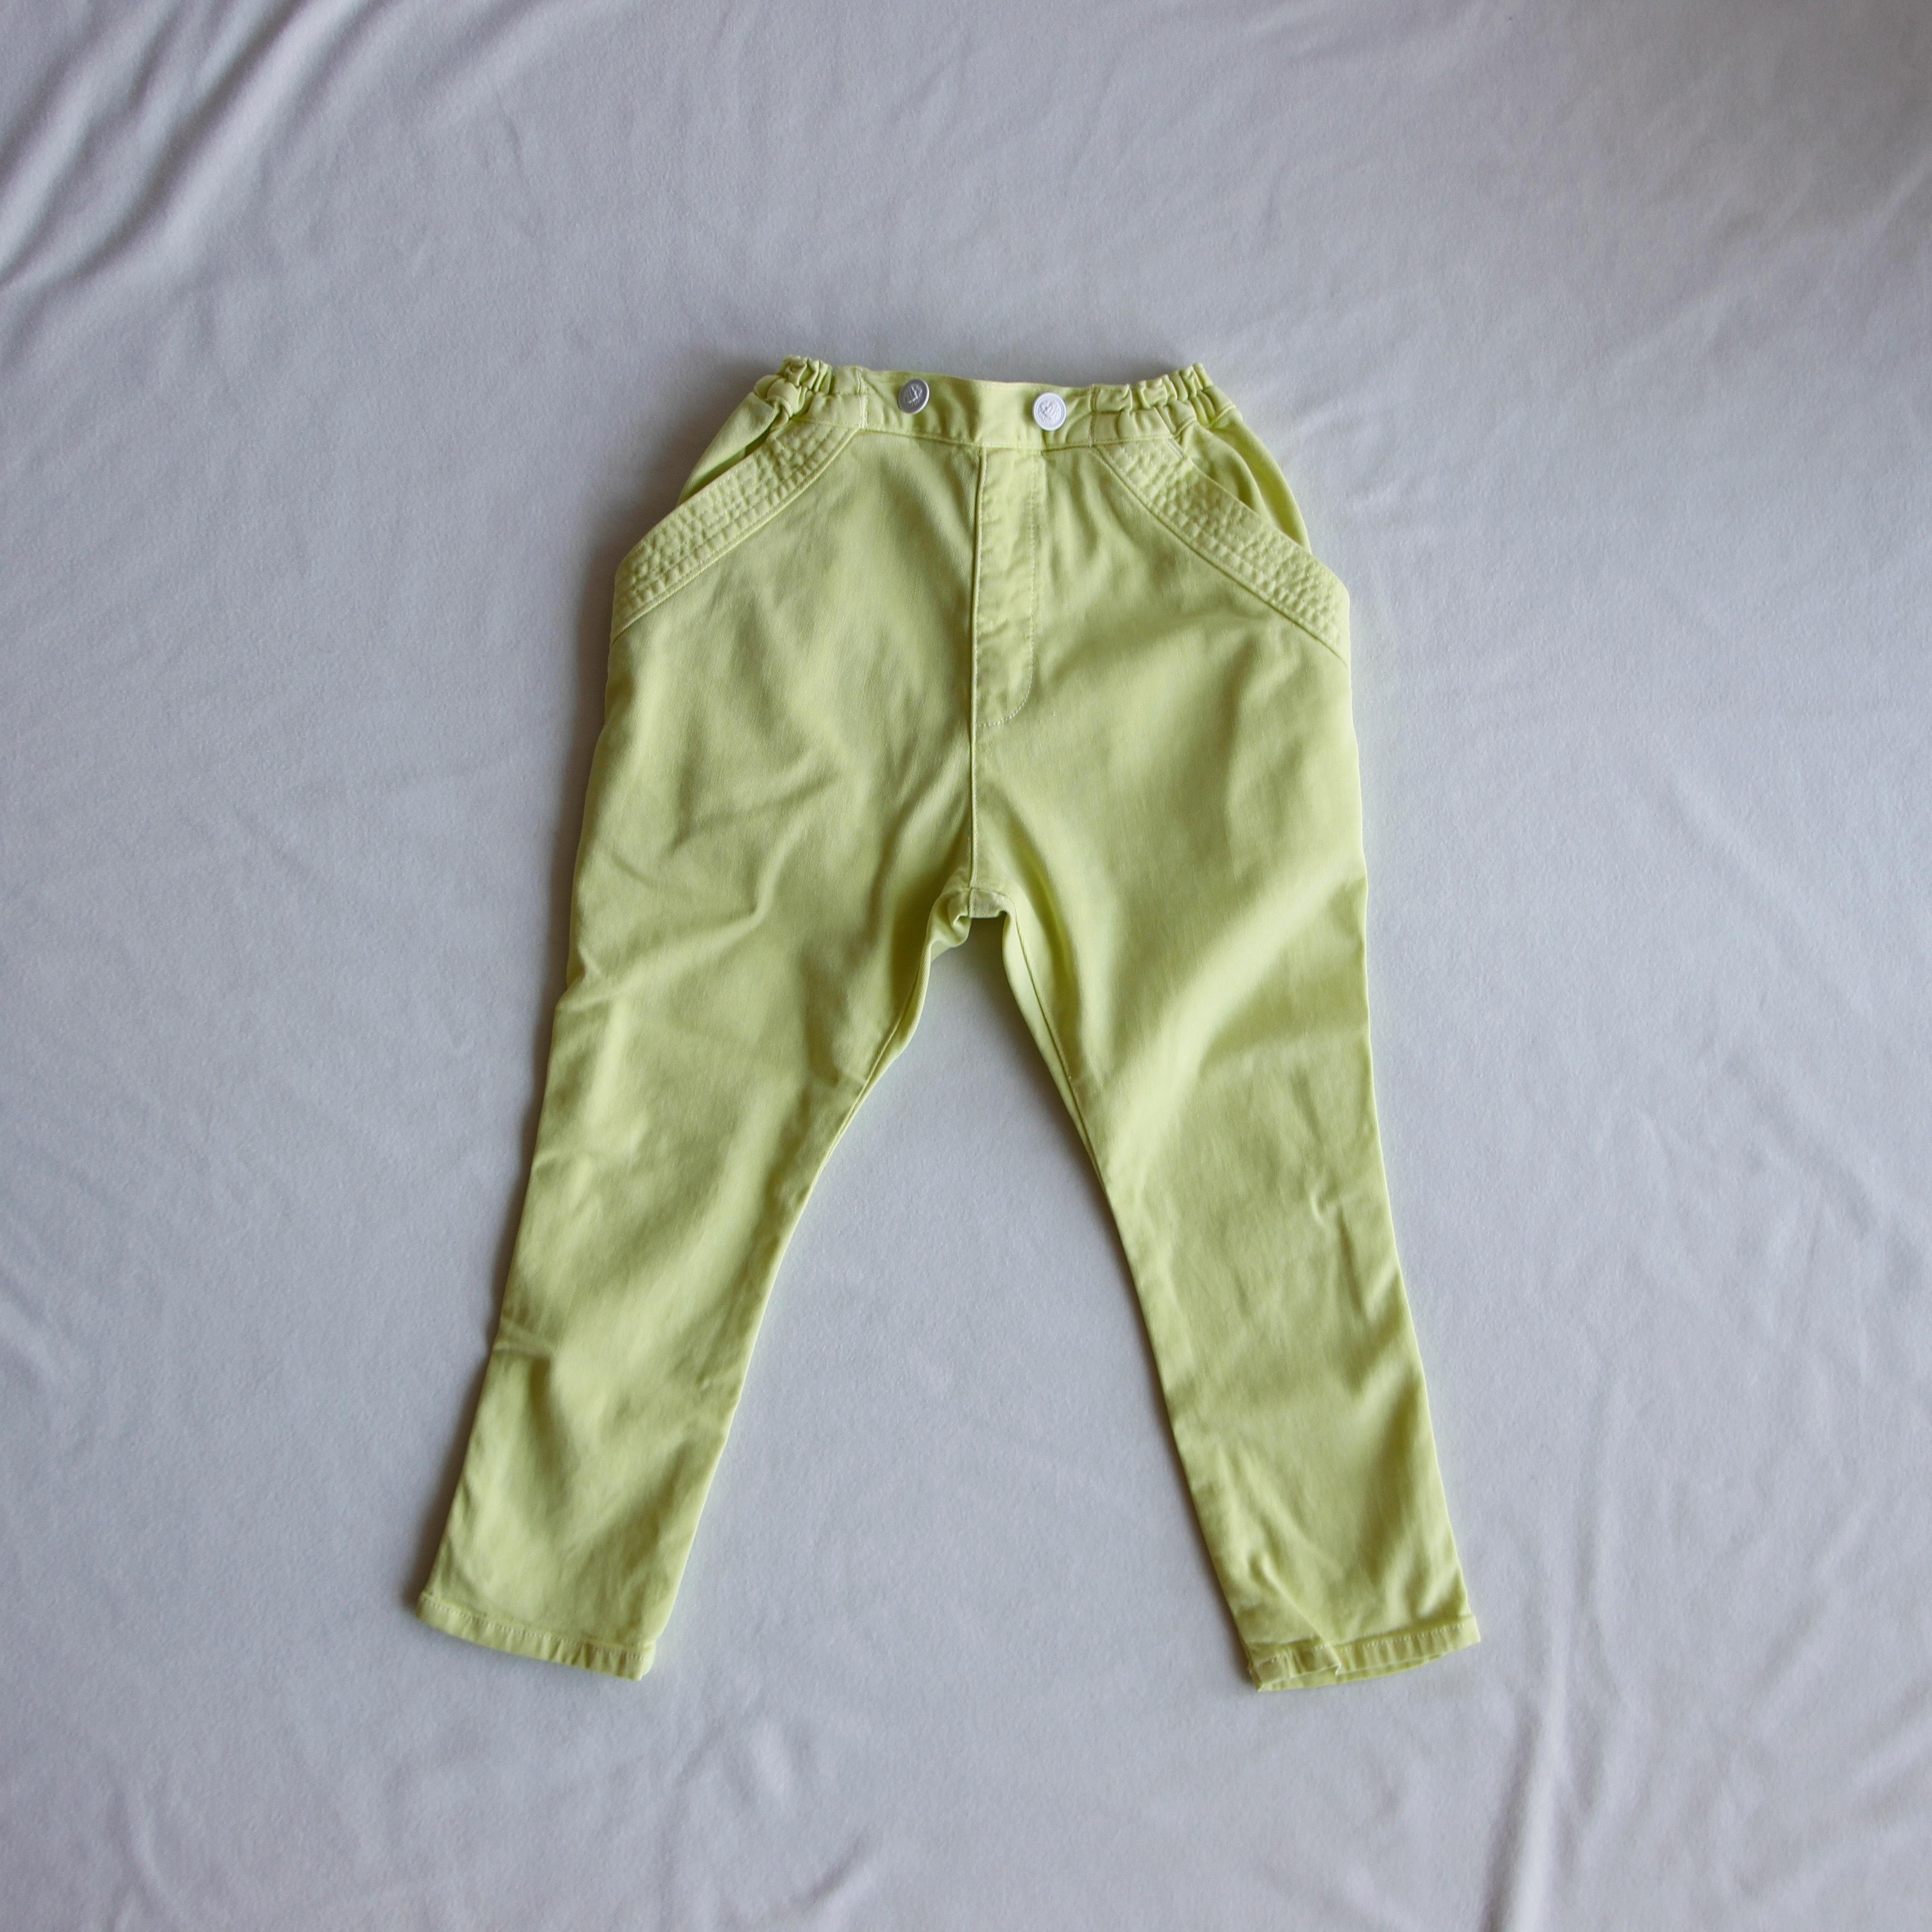 《cokitica 2017SS》sarrouel denim U-pants / yellow / XS・S